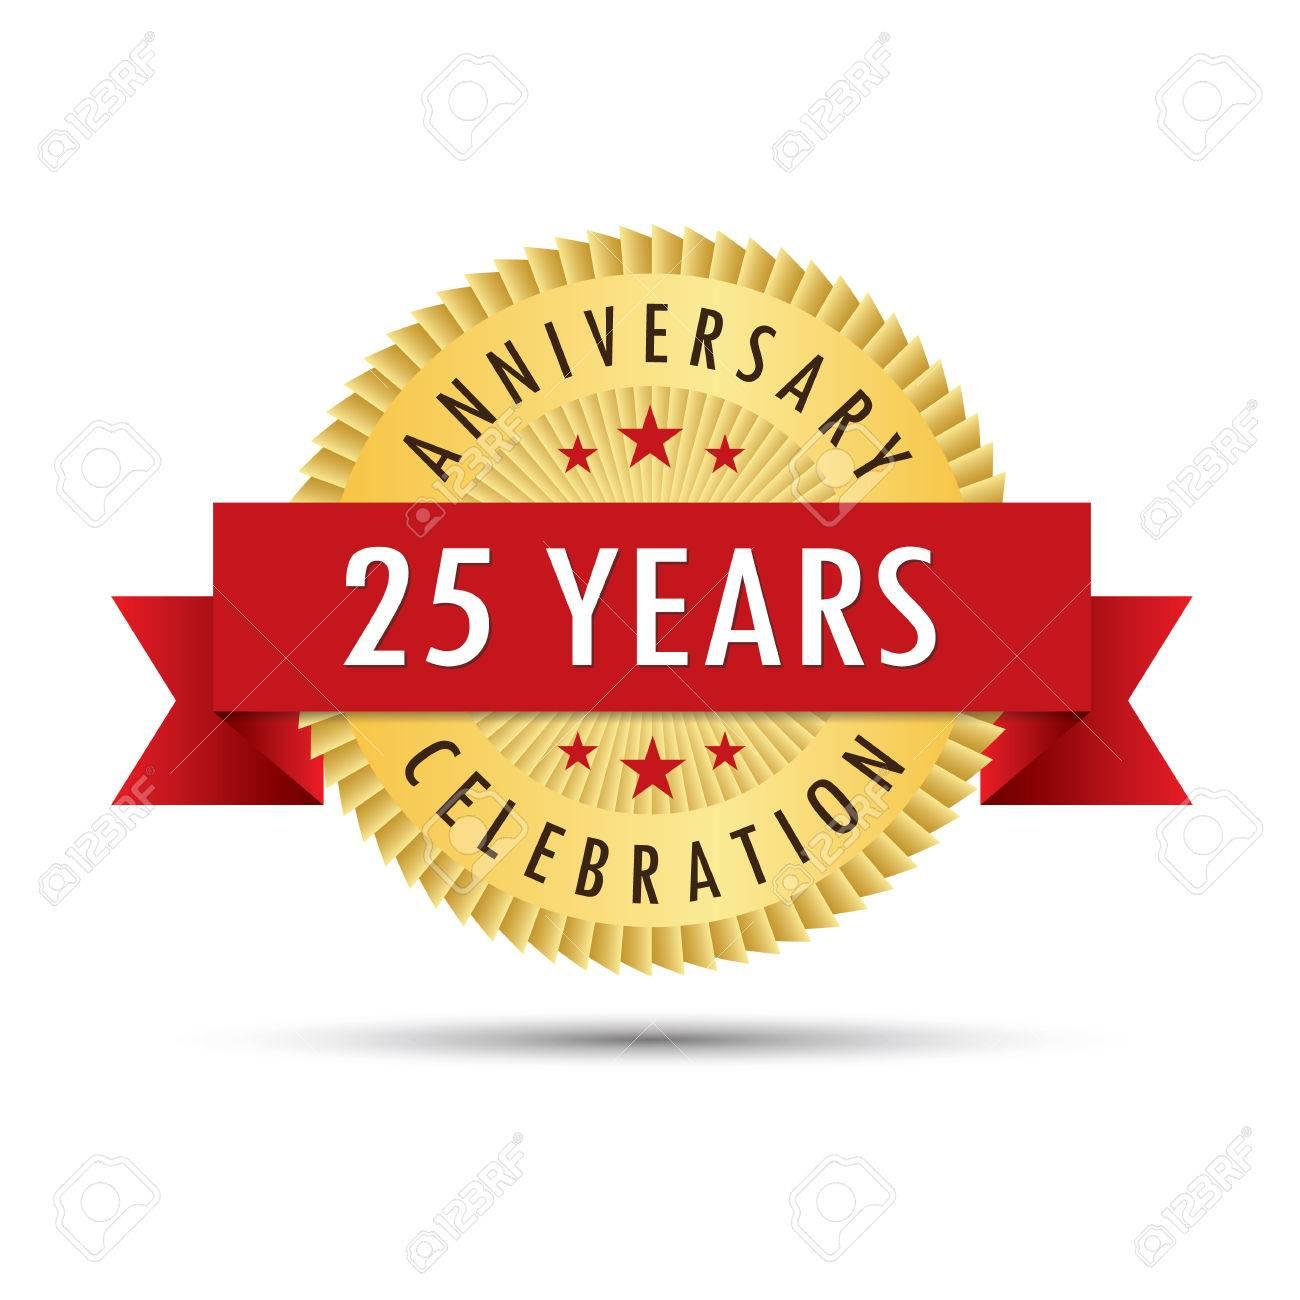 Twenty five years anniversary, twenty fifth anniversary celebration gold badge icon logo vector graphic design - 60970087